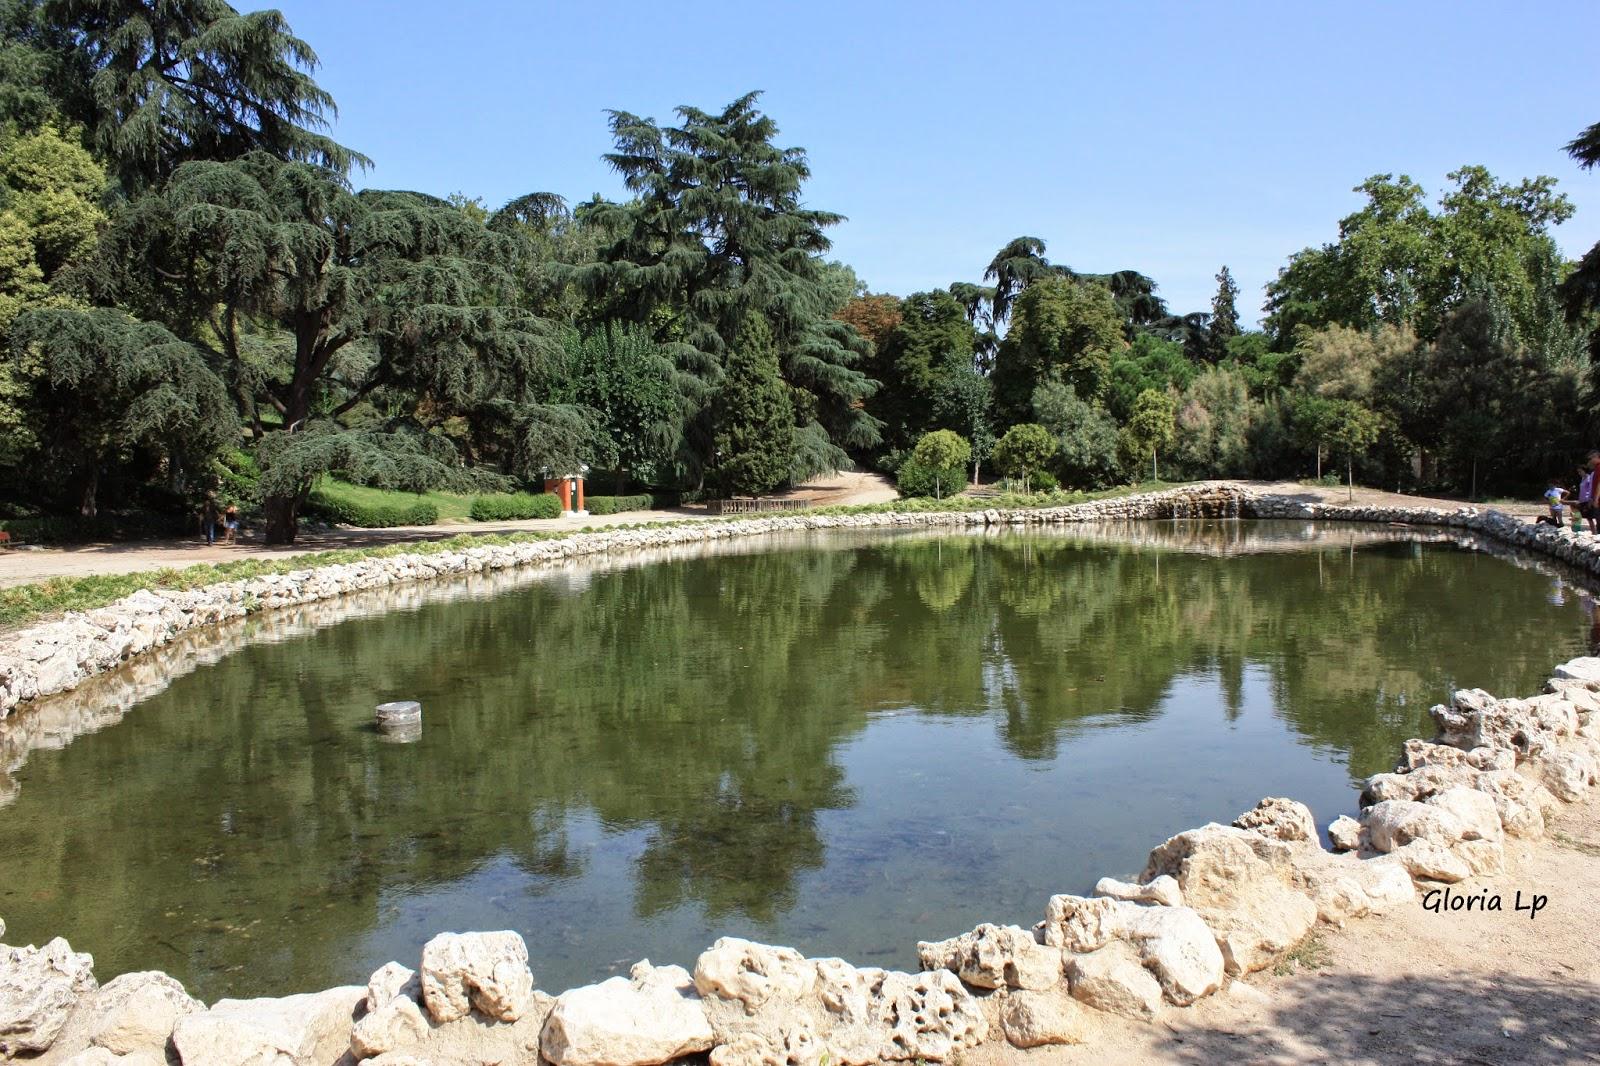 Otra mirada parque fuente del berro for Piscina fuente del berro